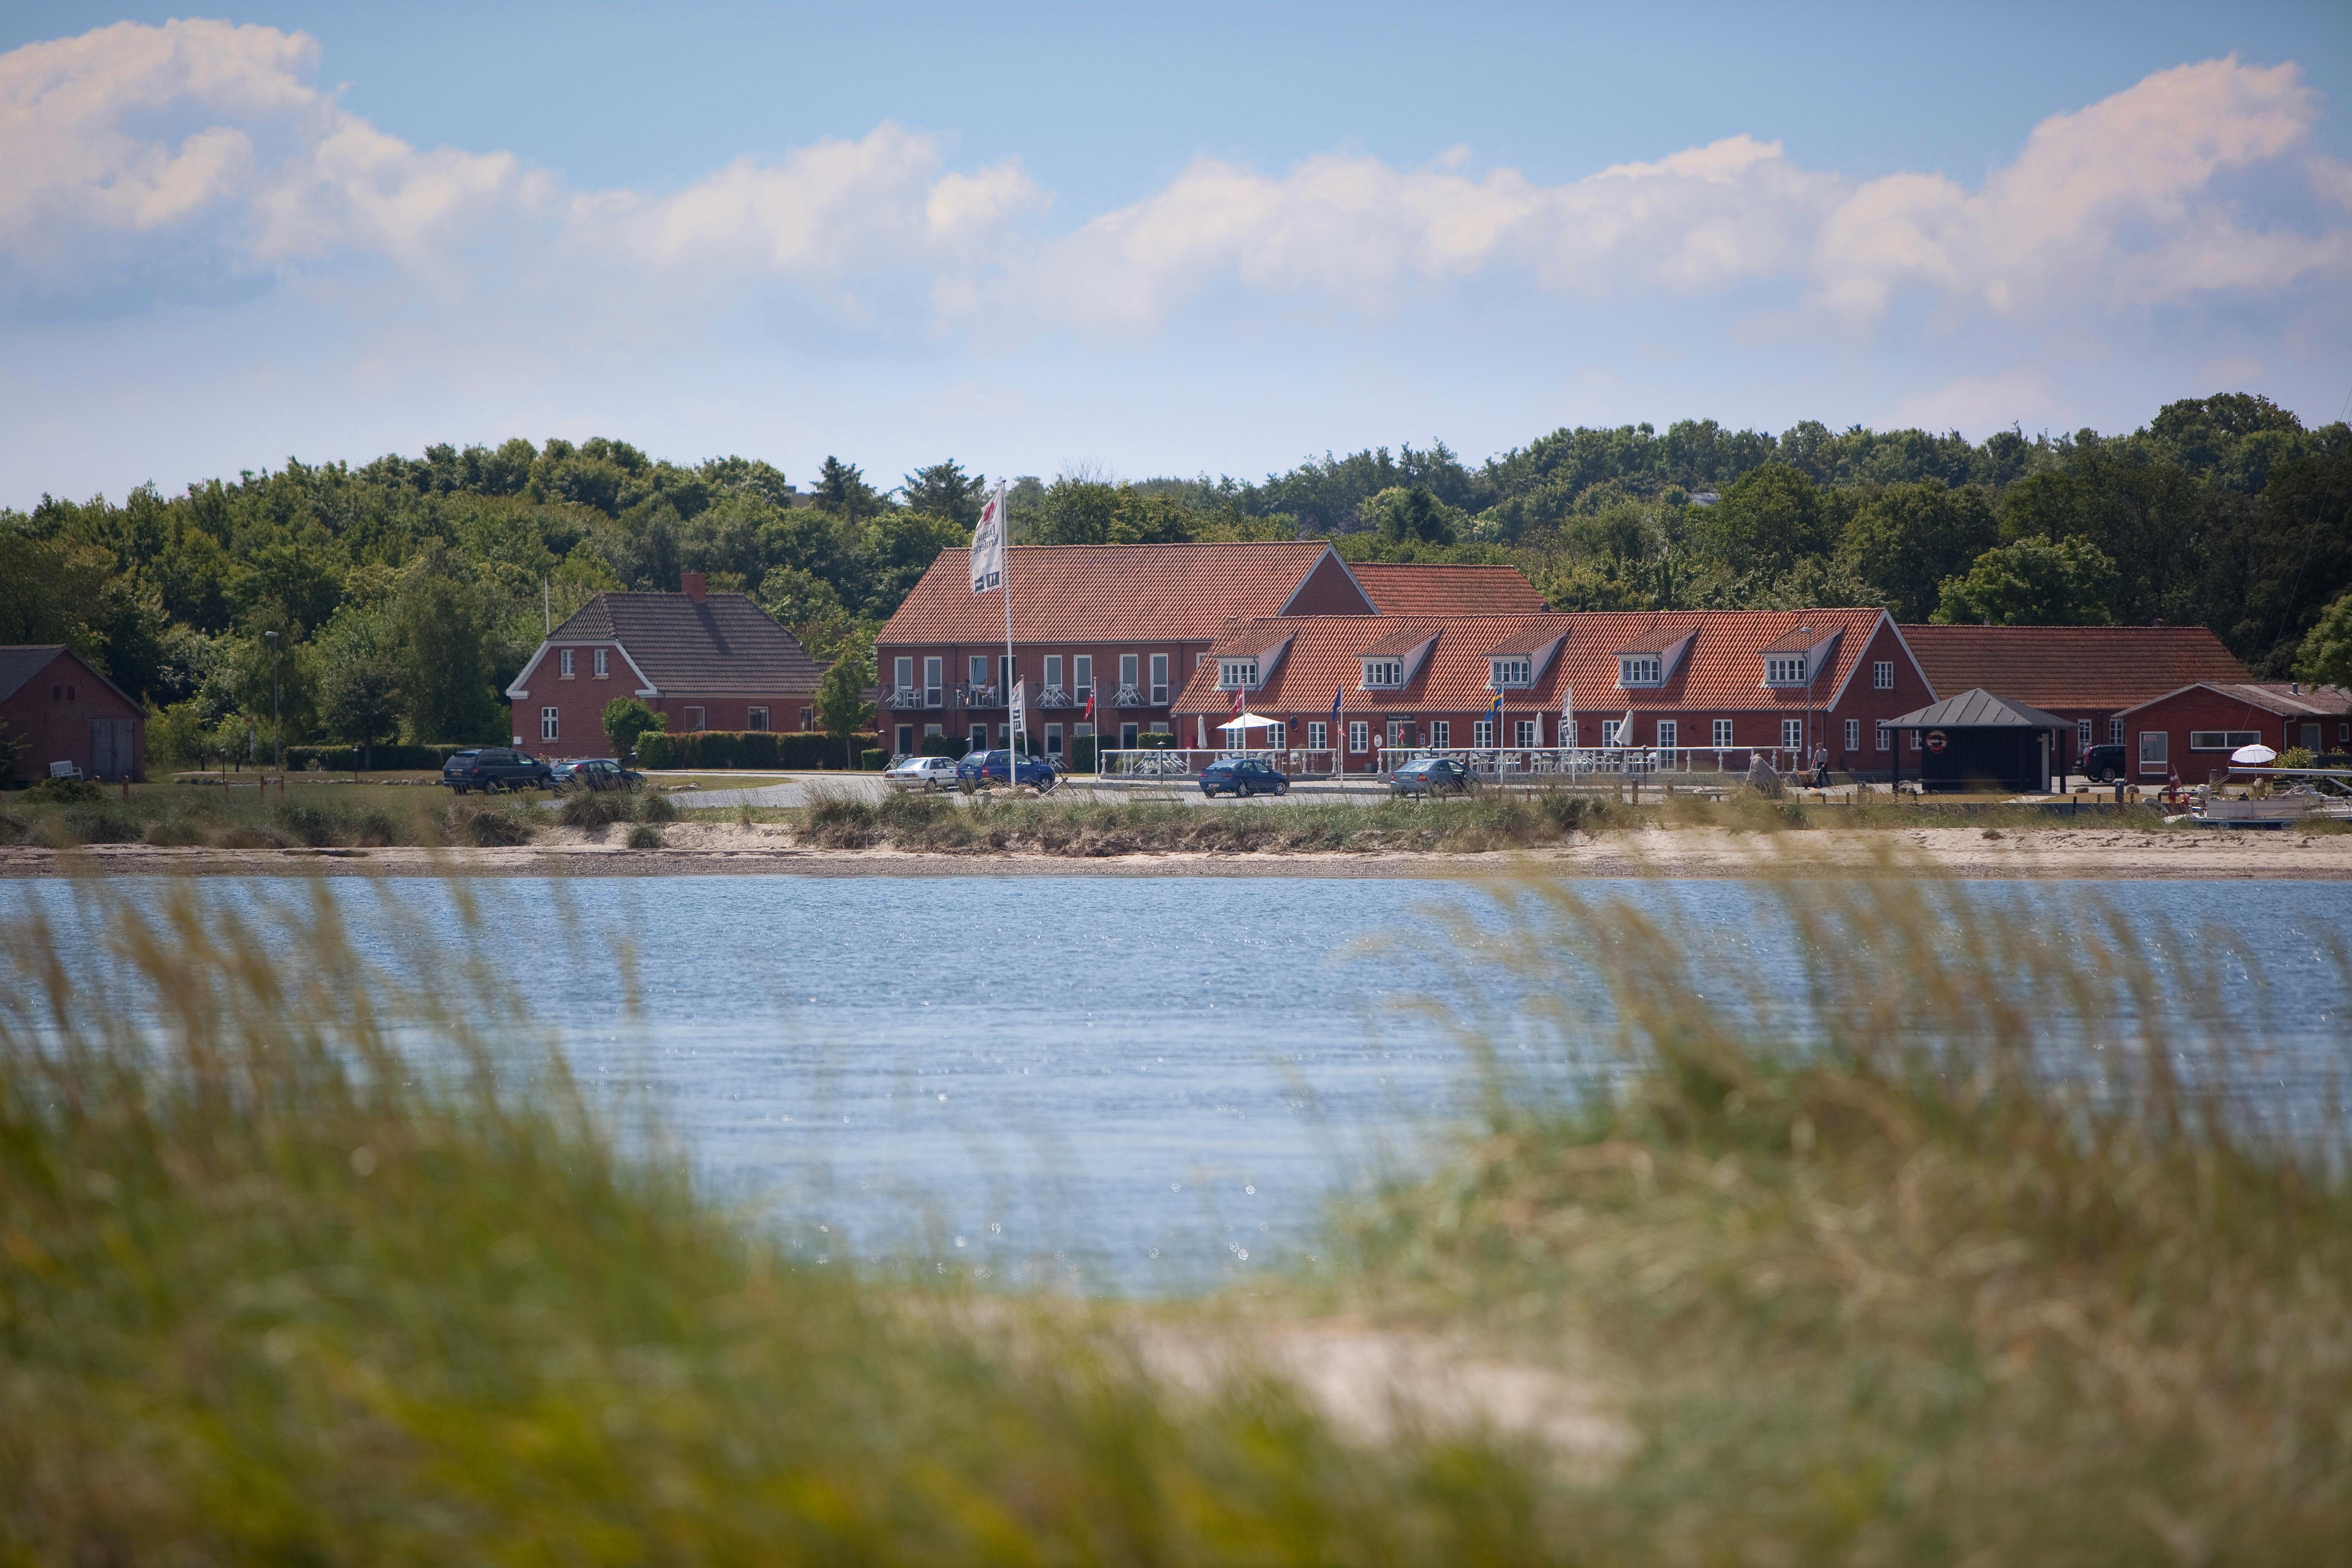 høns til salg nordsjælland escort girls copenhagen